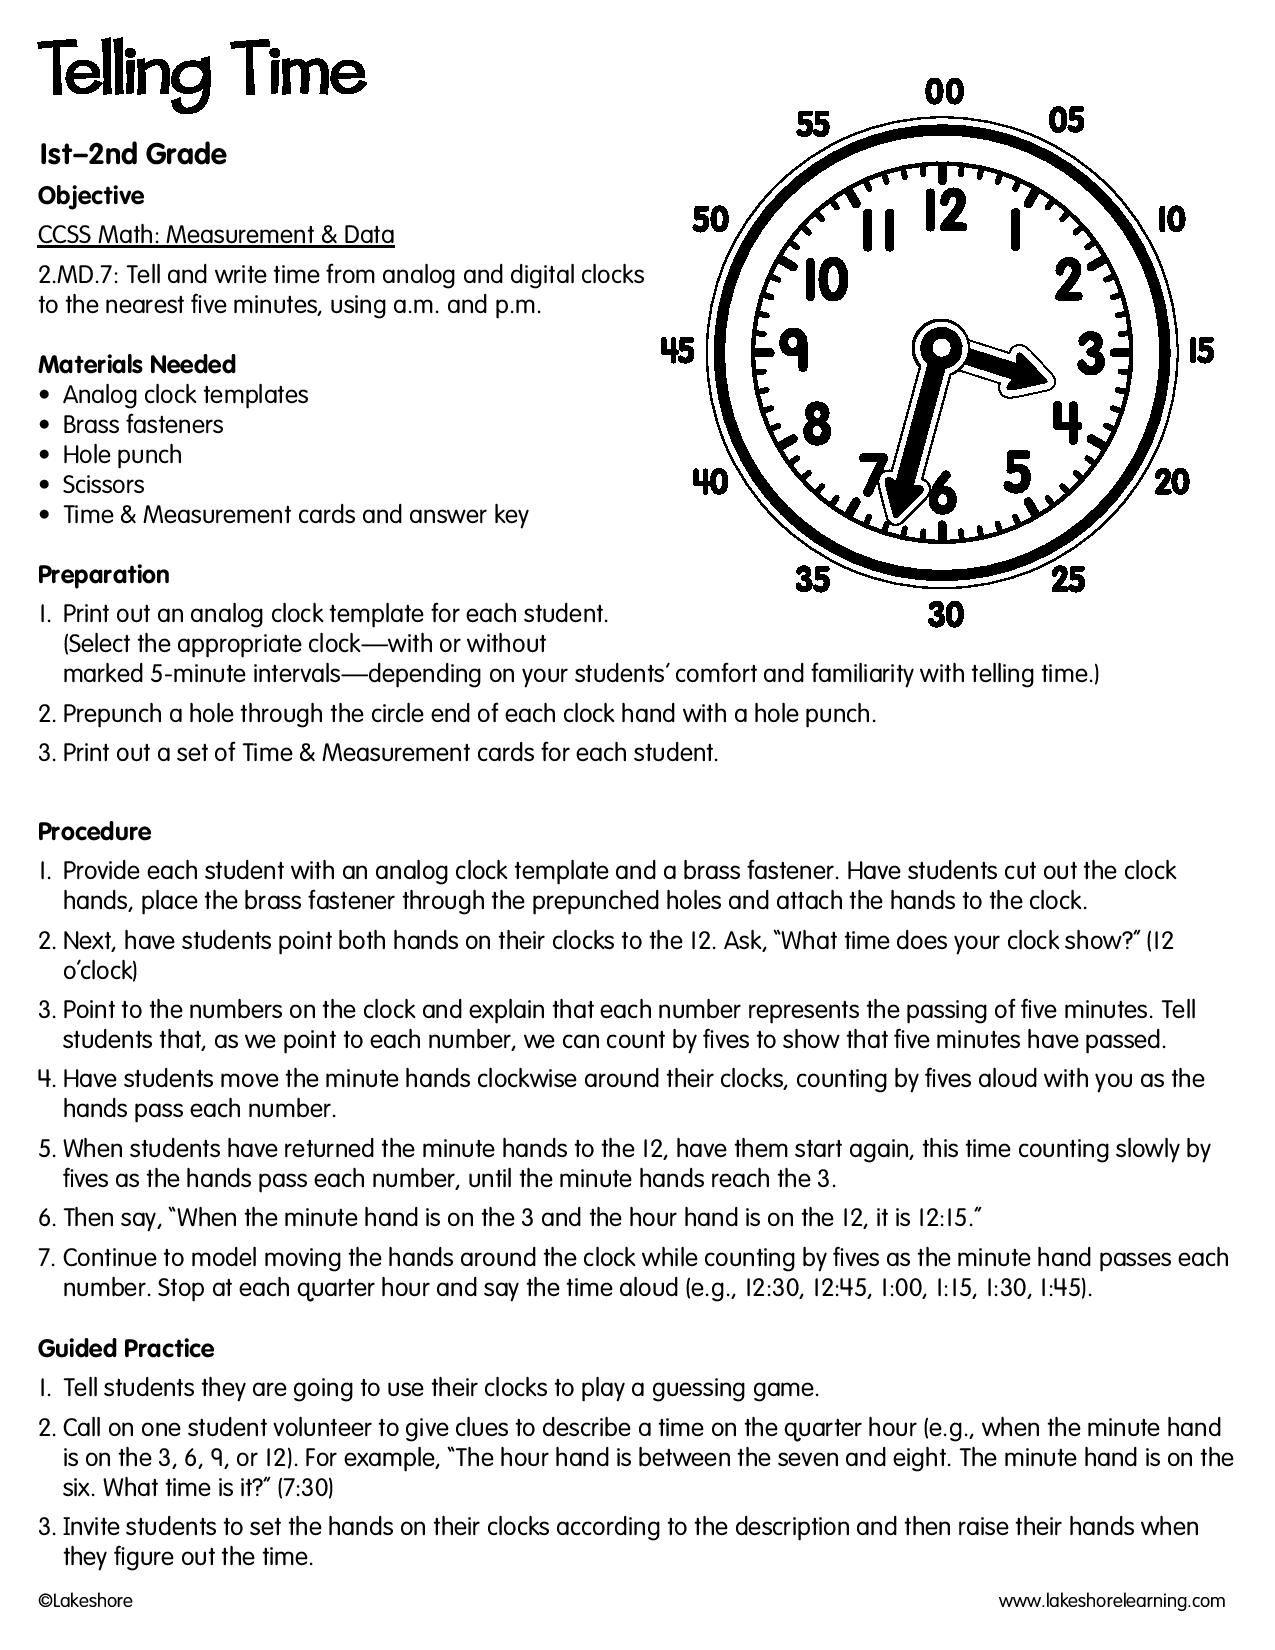 Telling Time Lessonplan